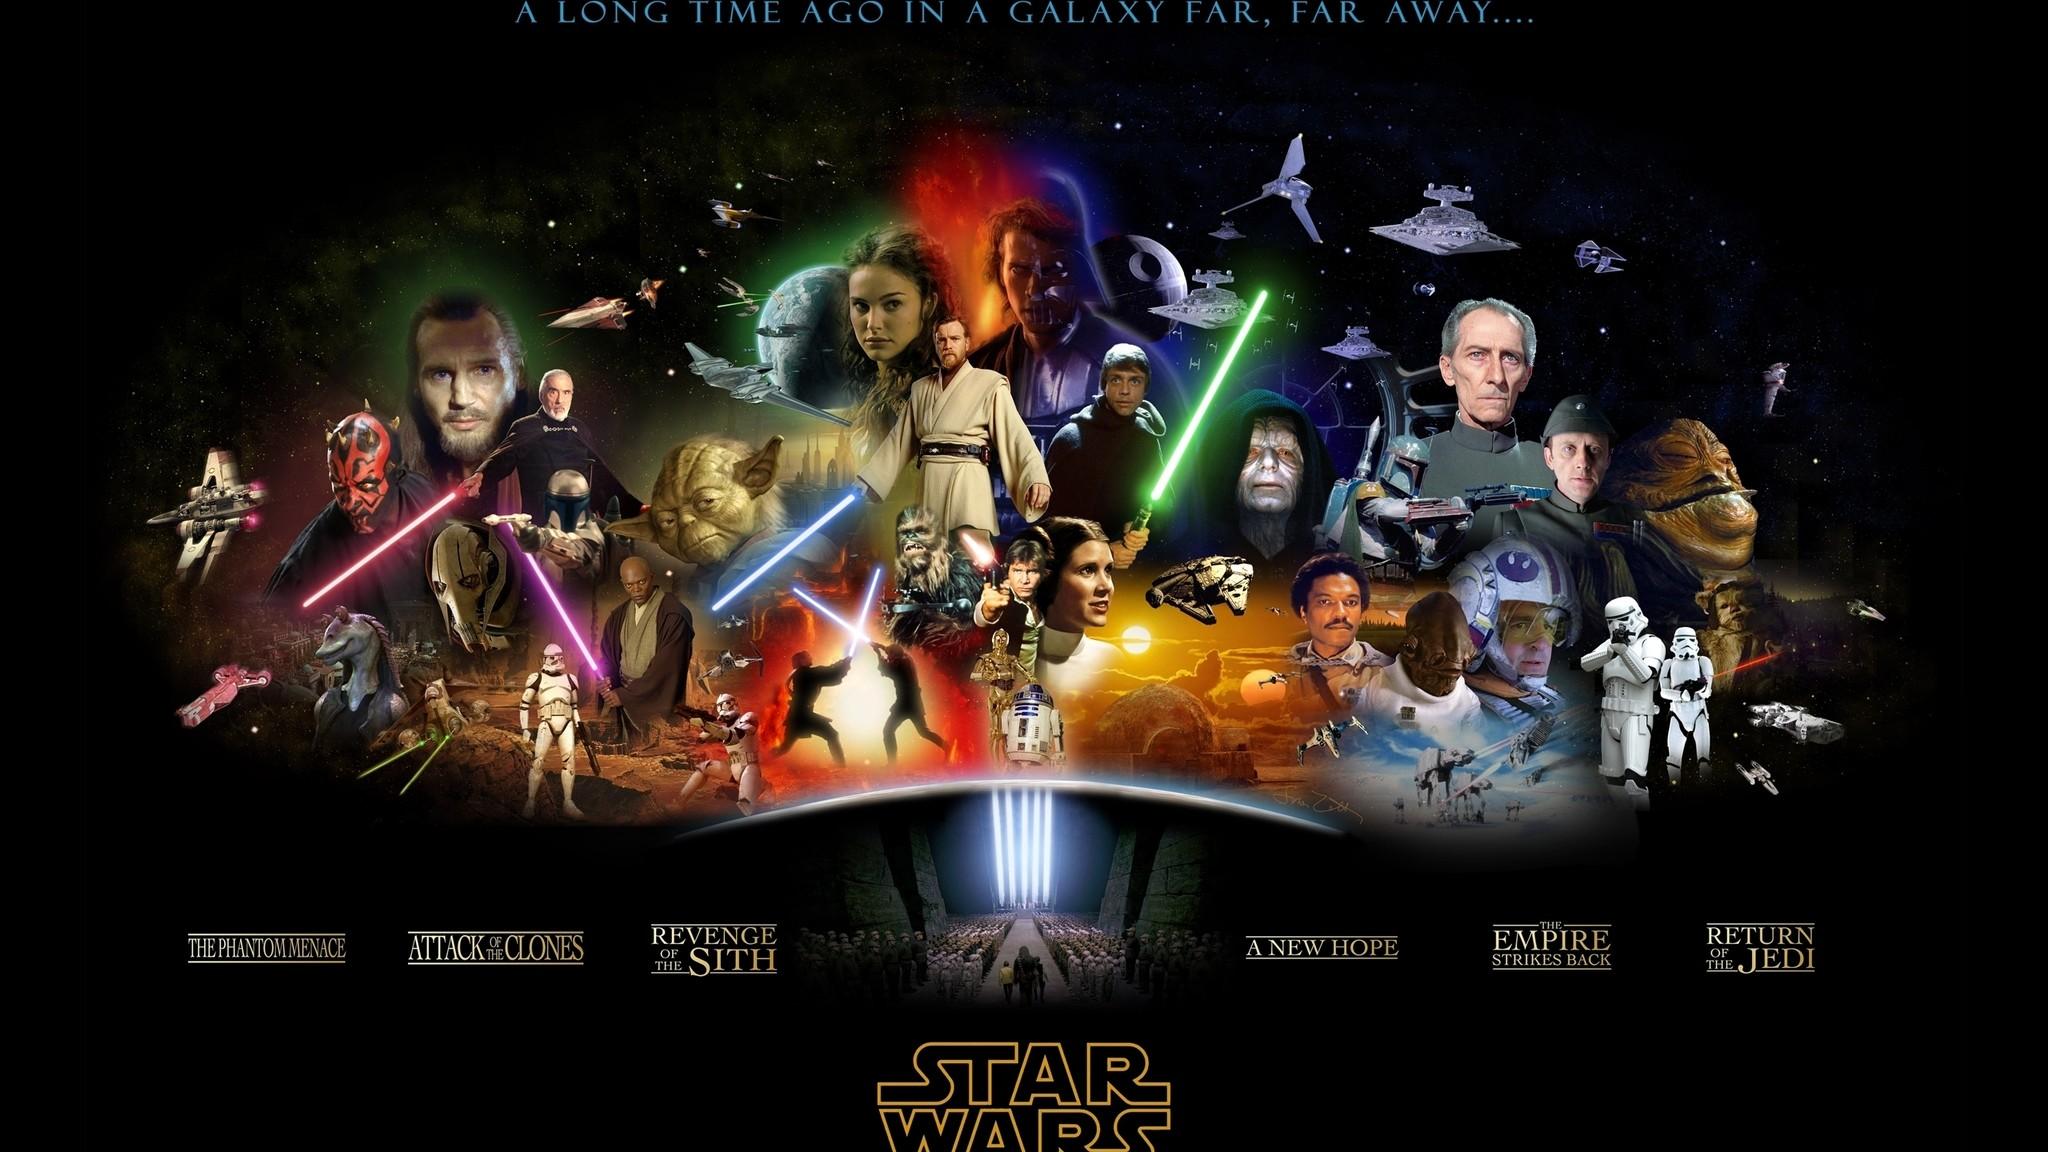 Description: Download Star wars movies stormtroopers darth maul darth vader boba  fett wallpaper/desktop background in HD & Widescreen resolution.